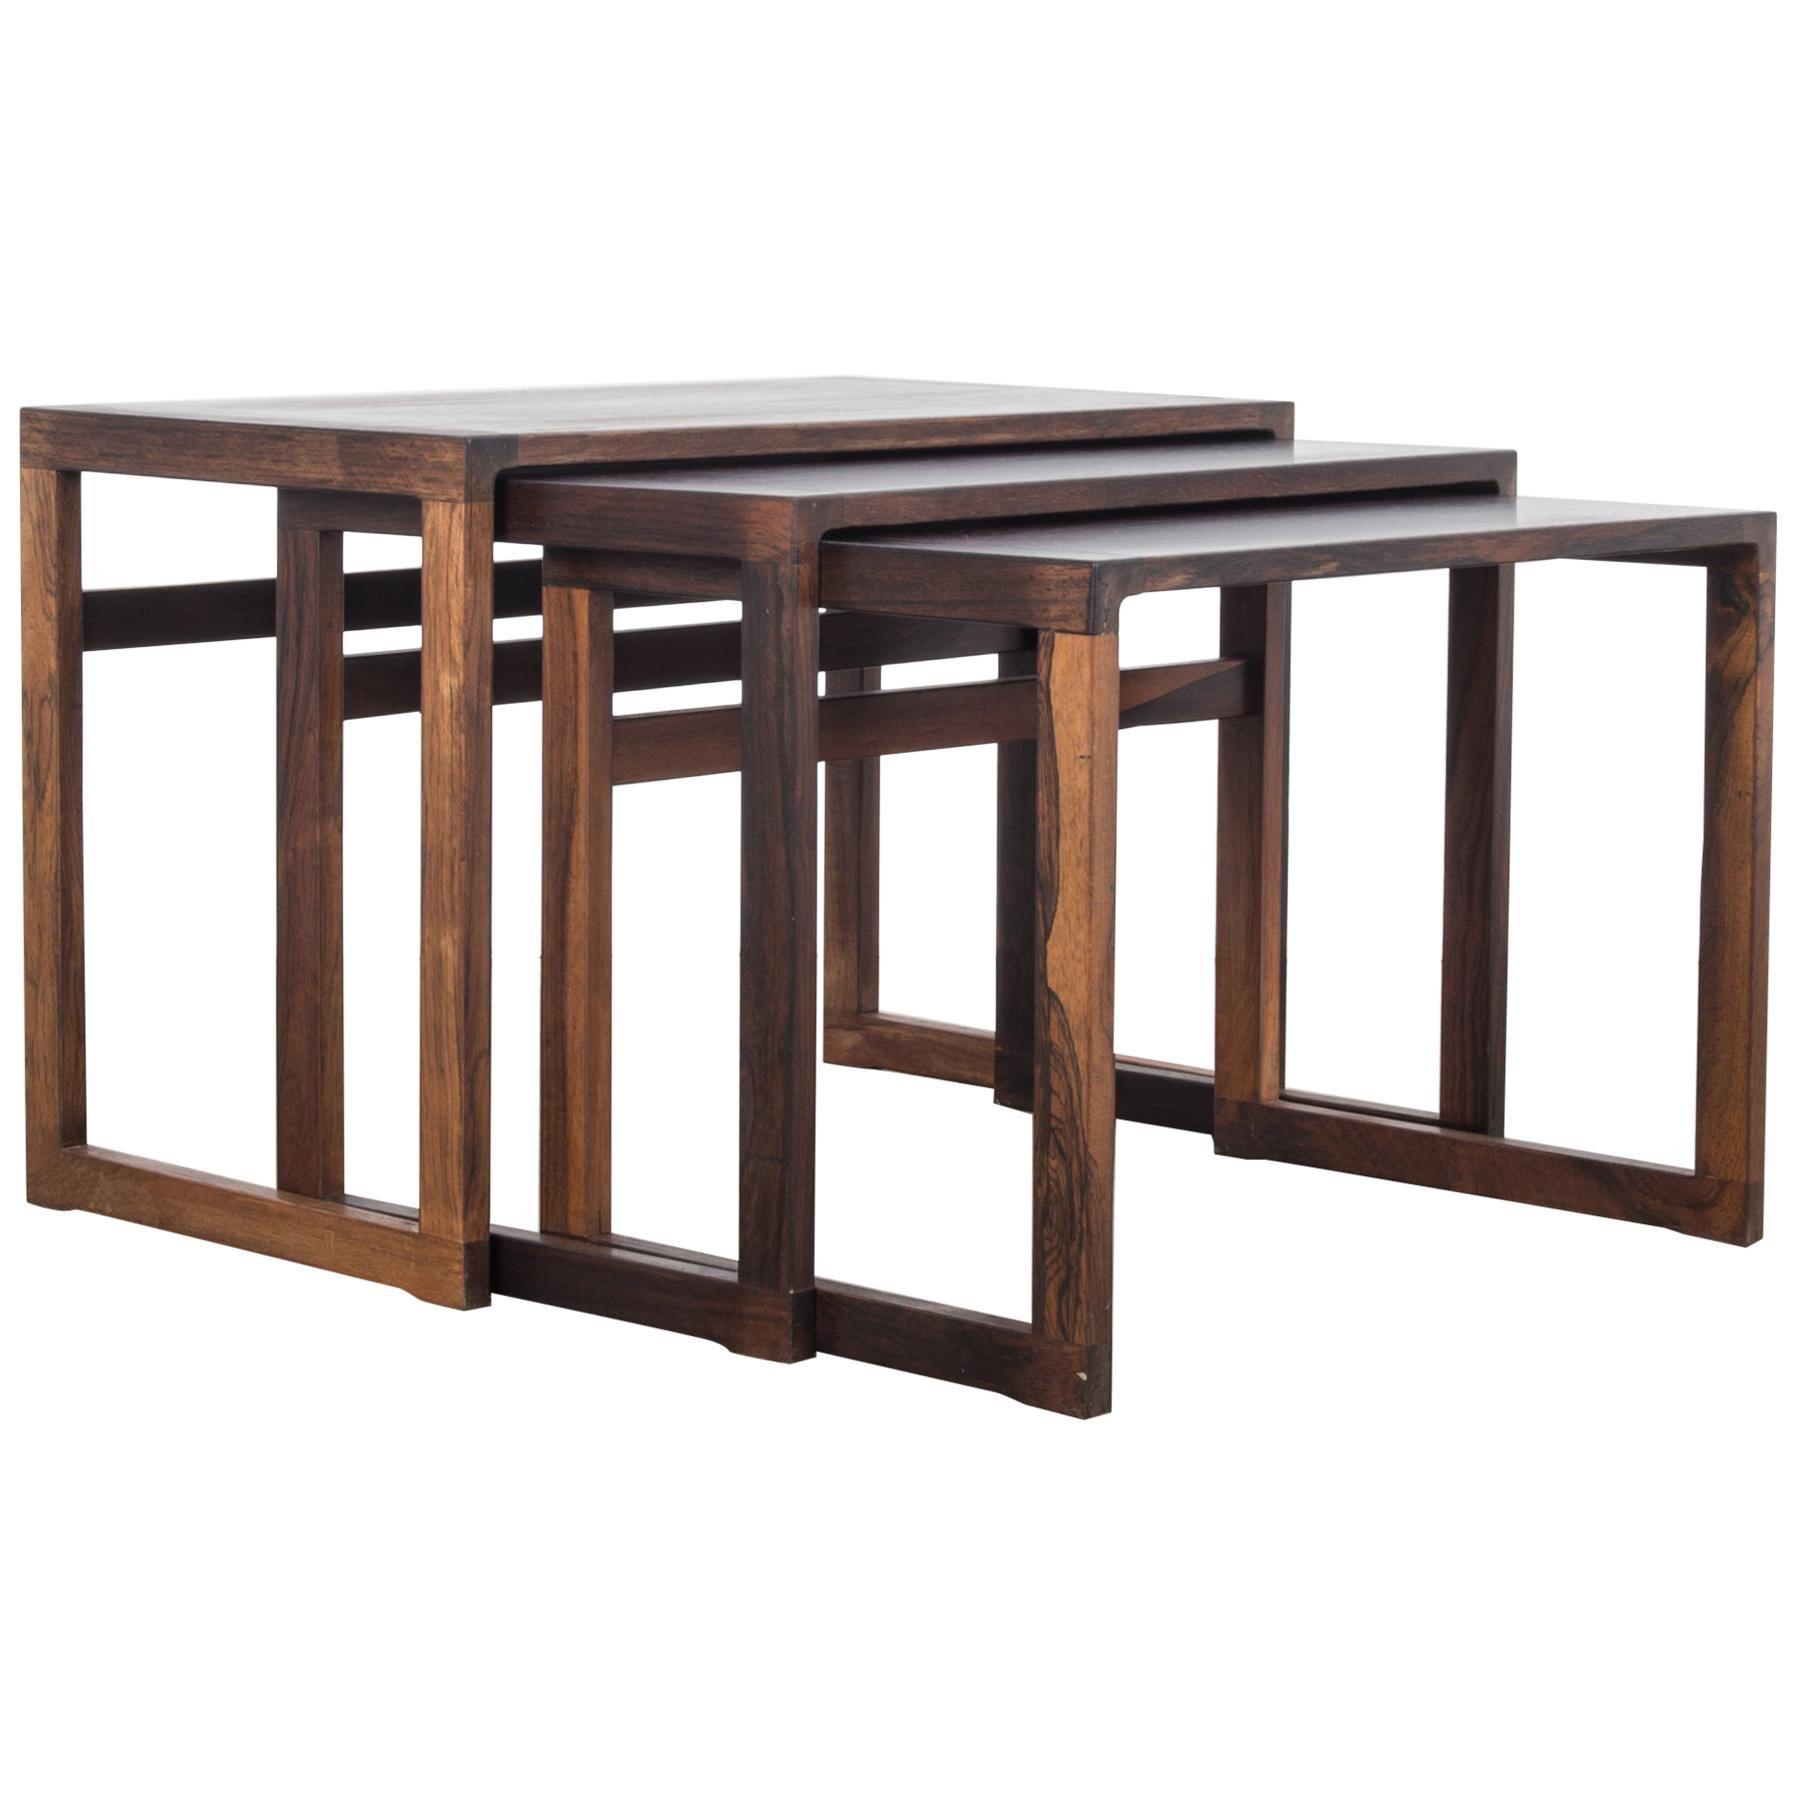 1960s Danish Wooden Nesting Tables, Set of Three